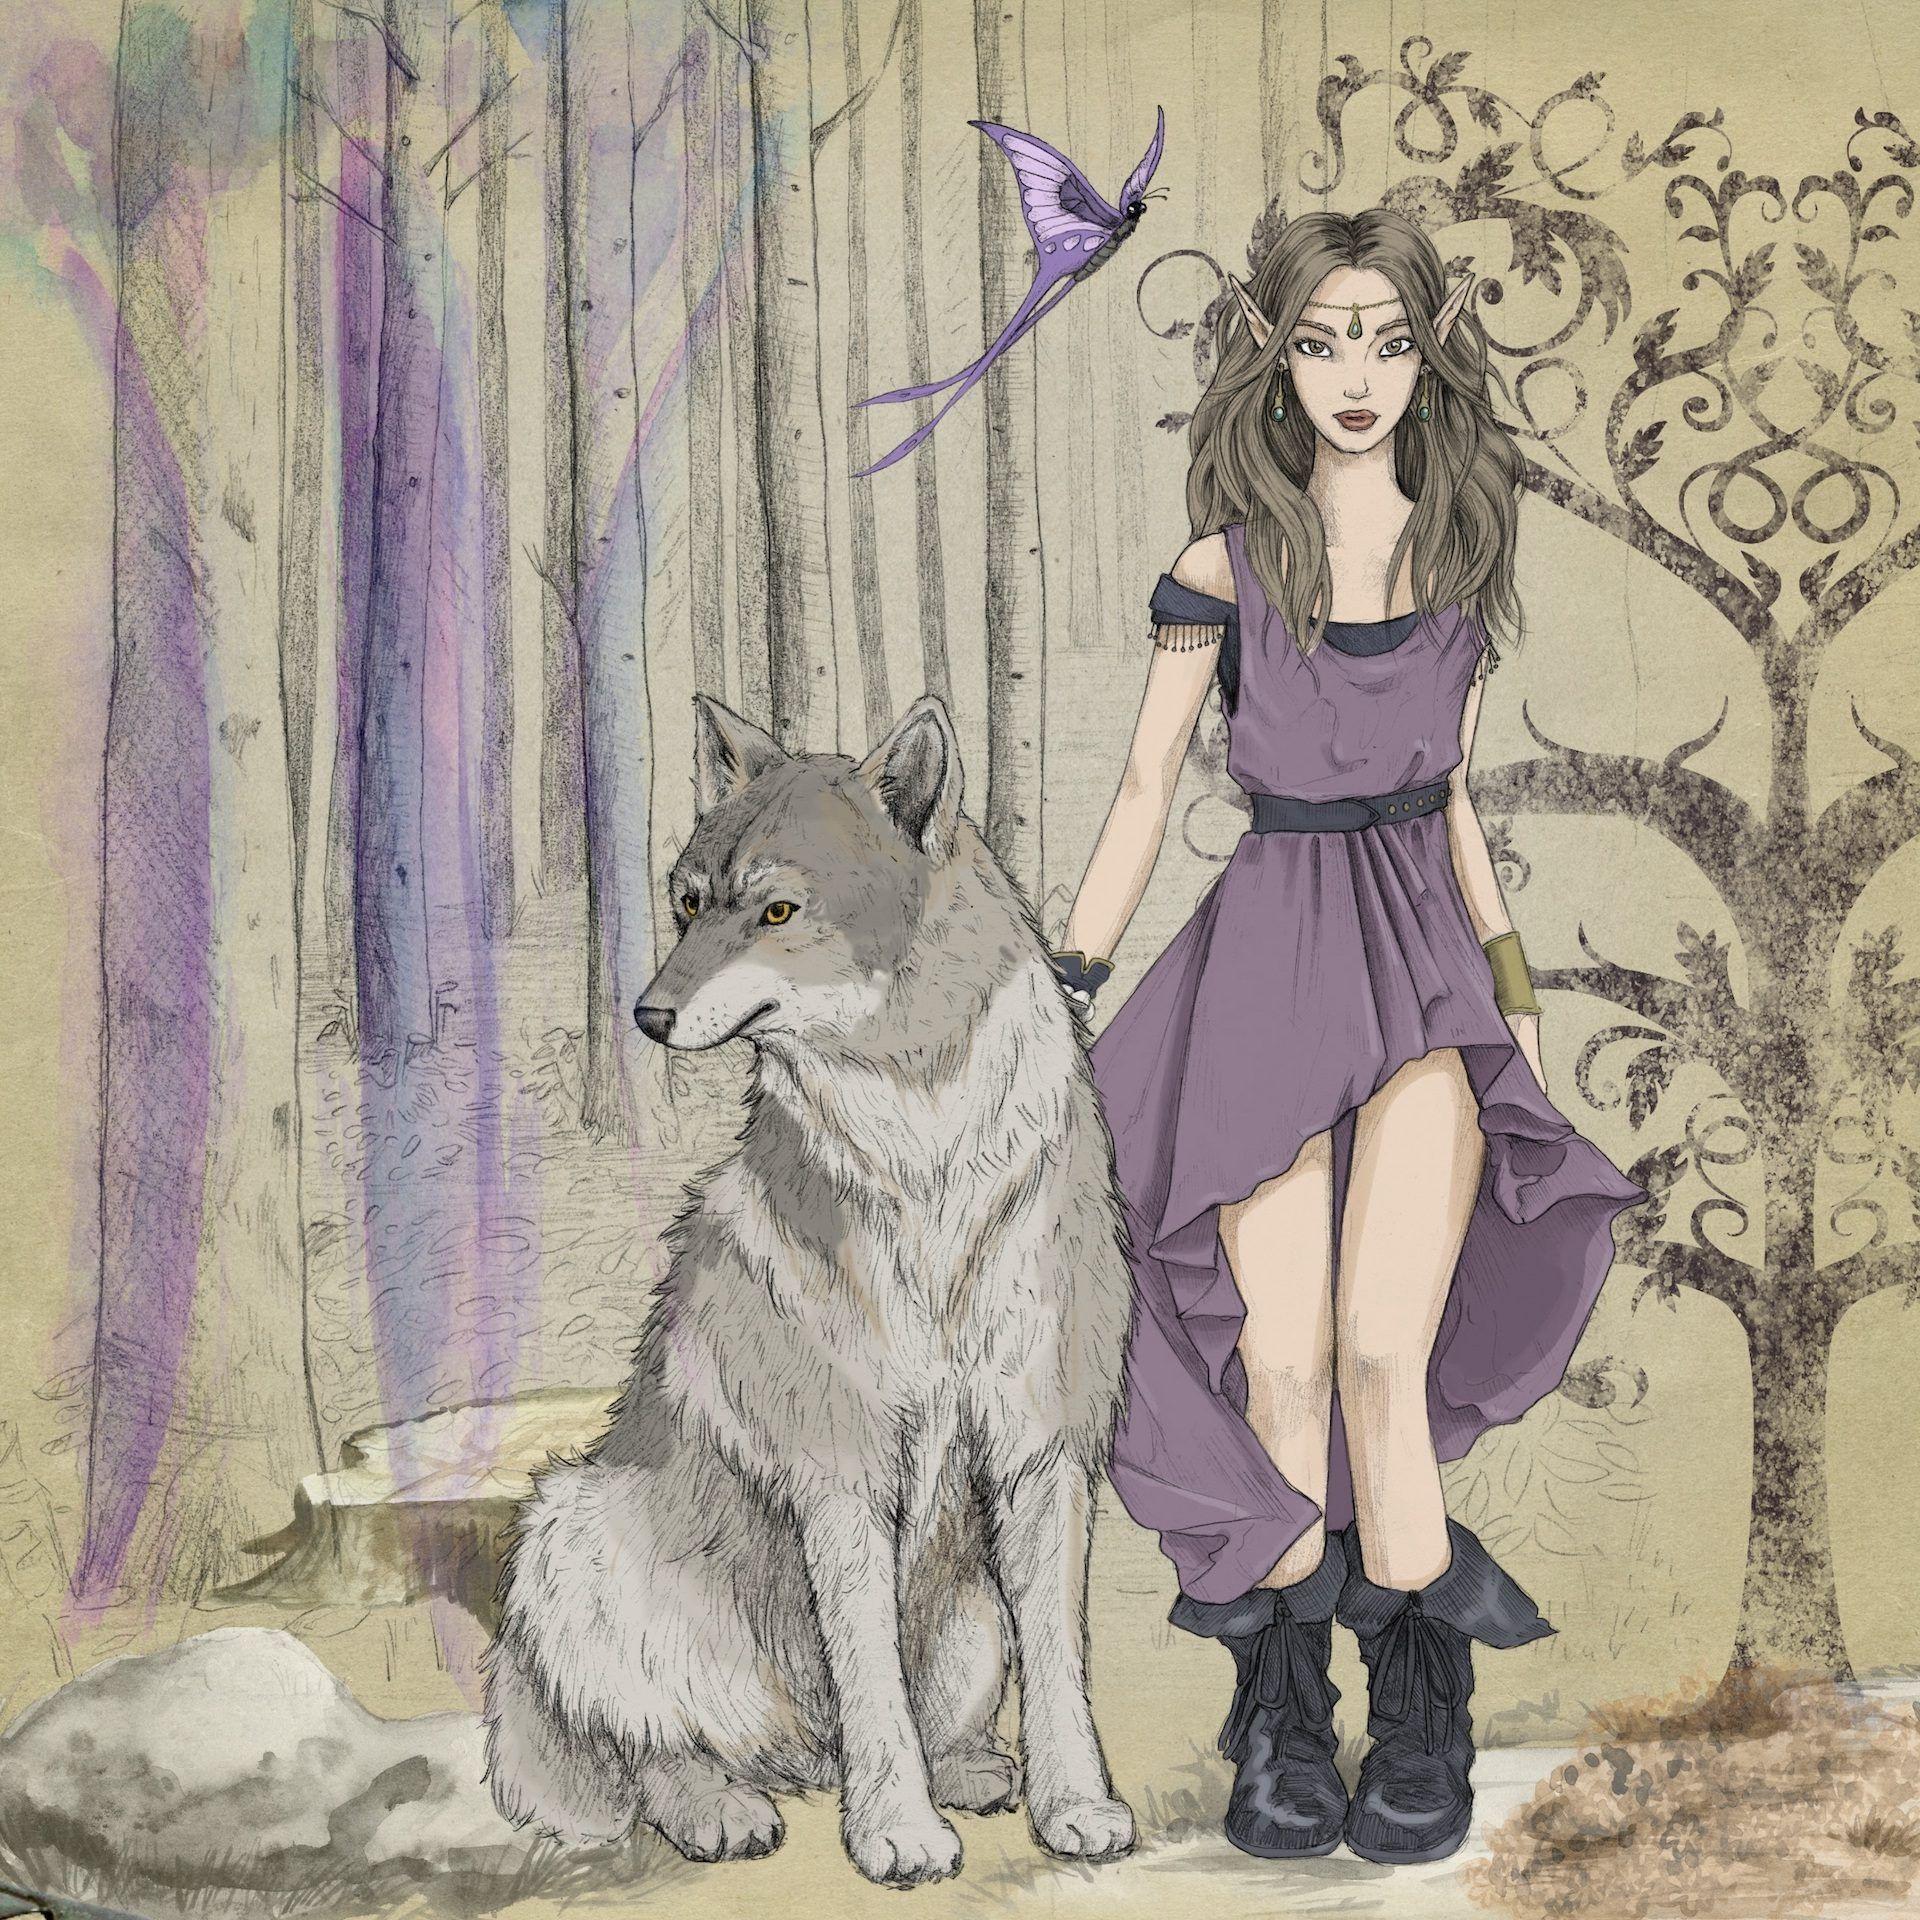 hada elfa cuento lobo chica fábula